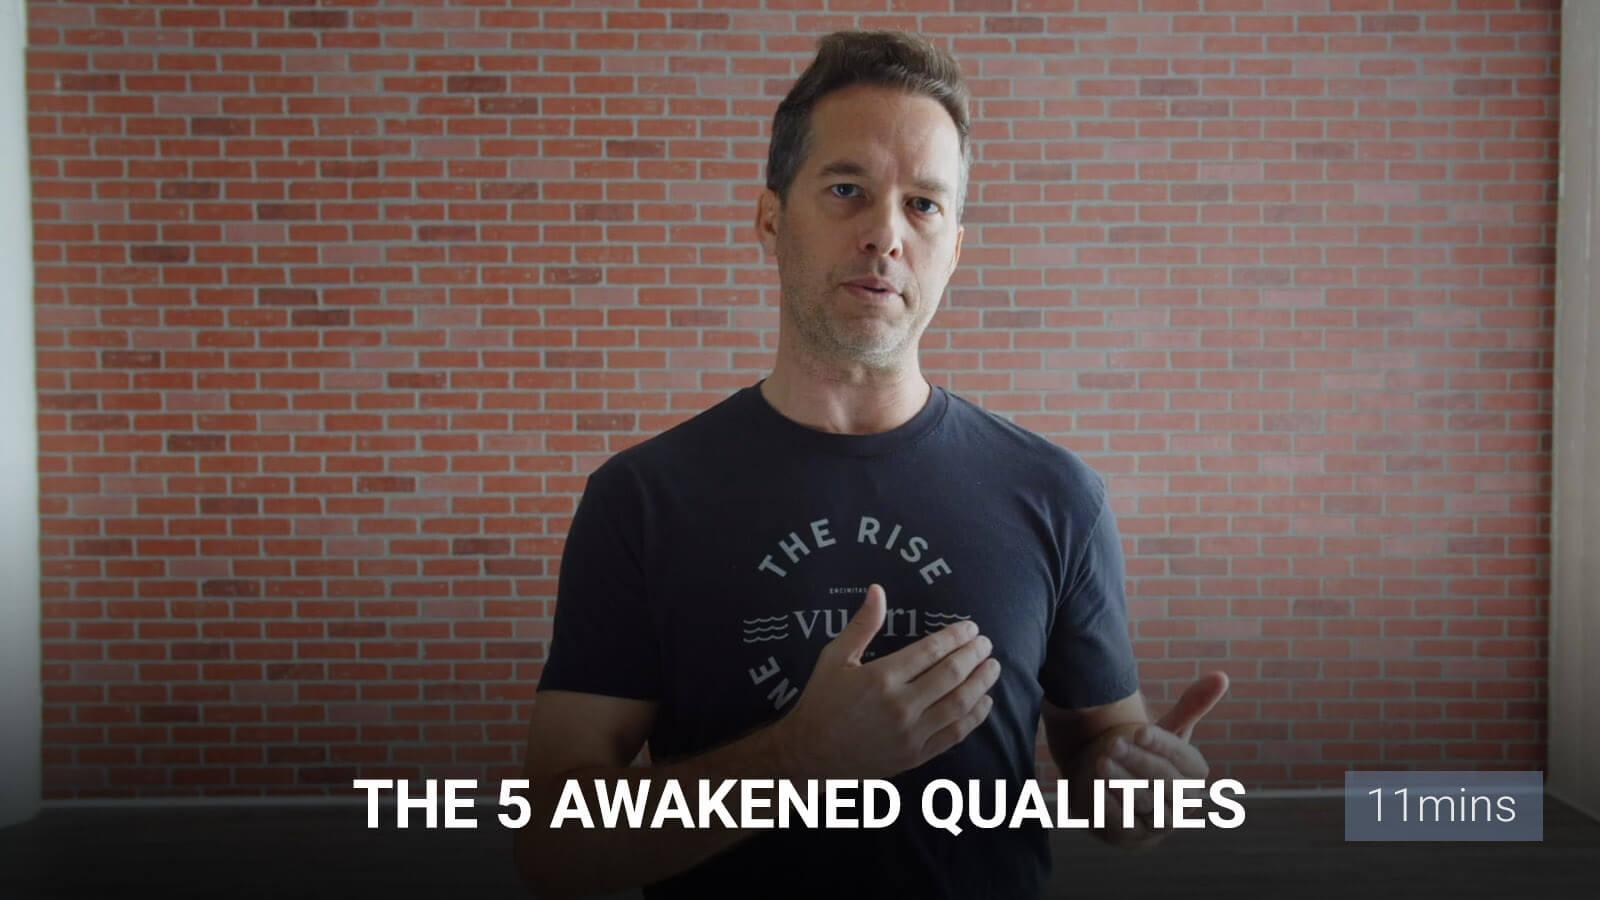 The 5 Awakened Qualities